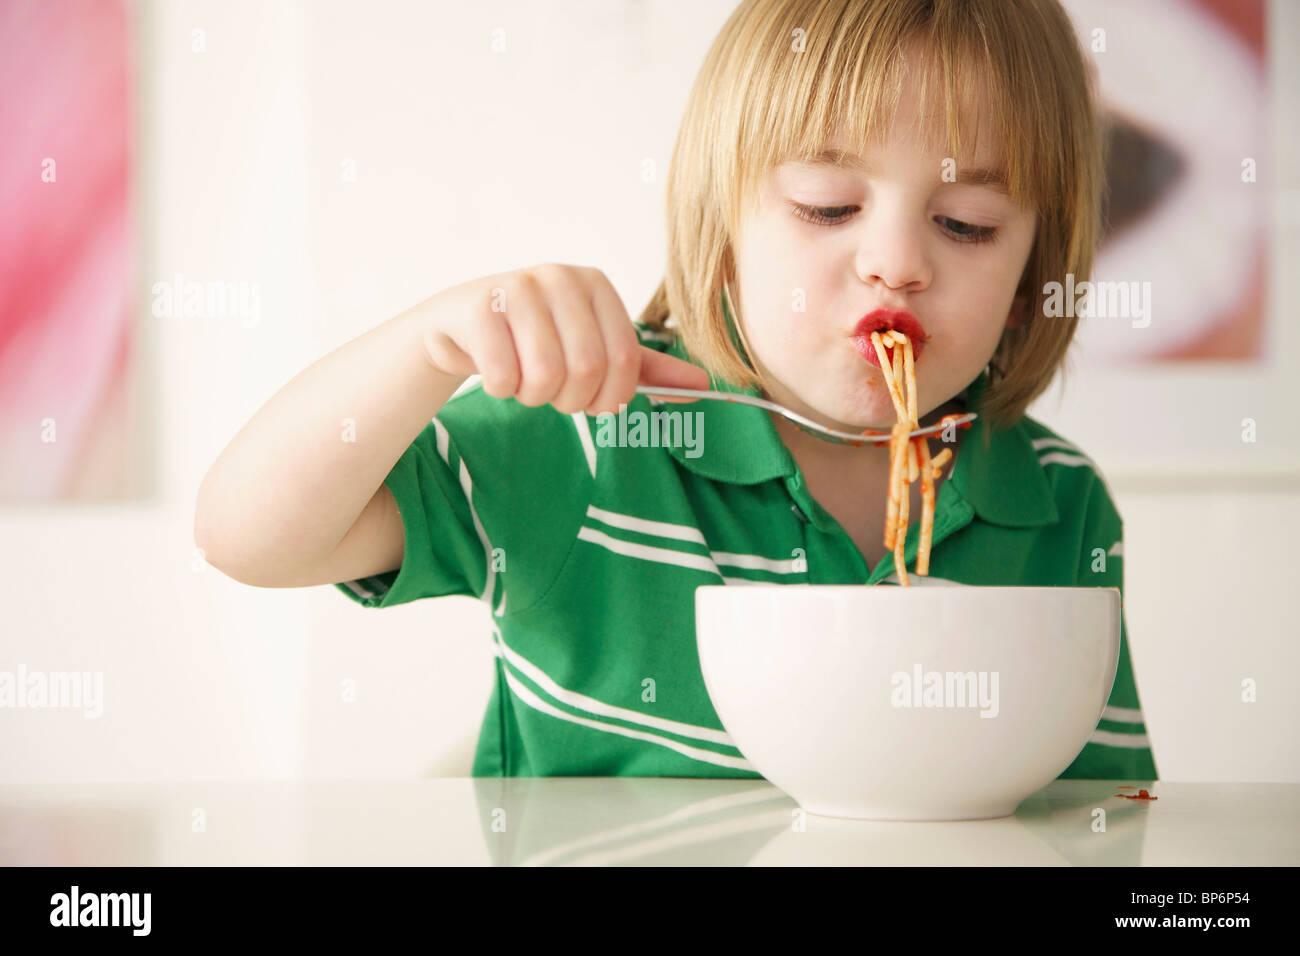 Un garçon mange du spaghetti Photo Stock